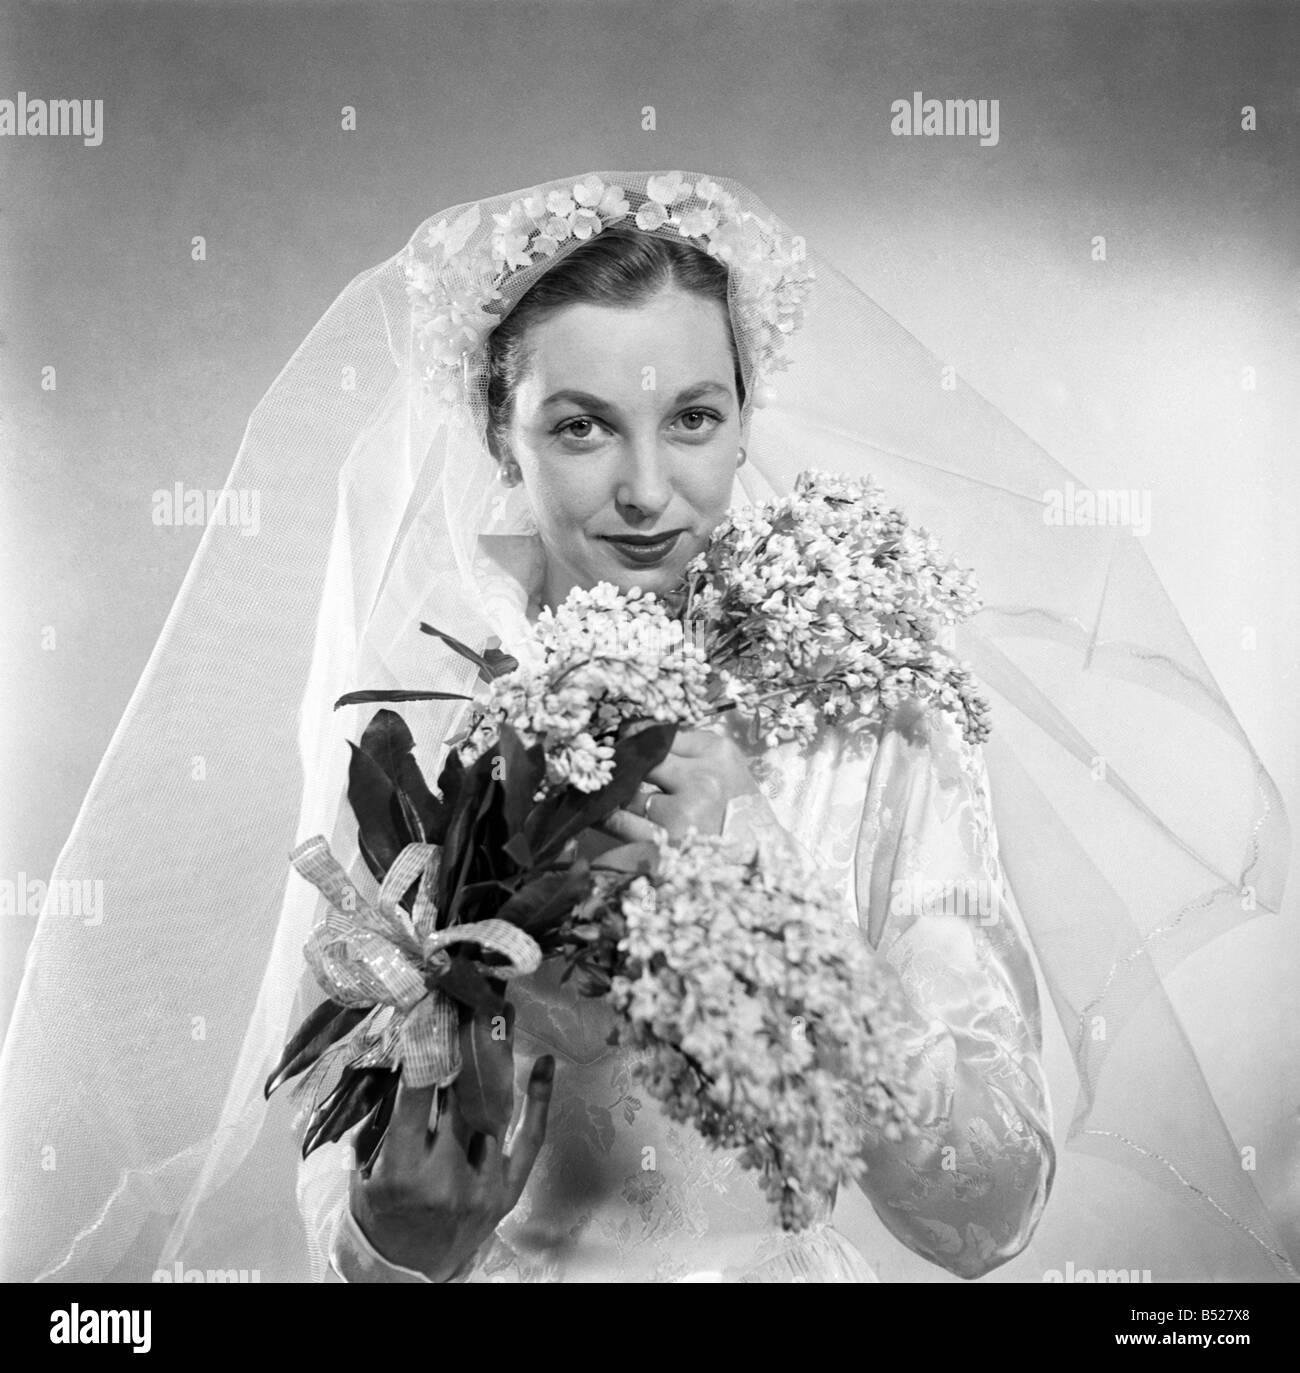 Wedding With Gloria Stock Photos & Wedding With Gloria Stock Images ...